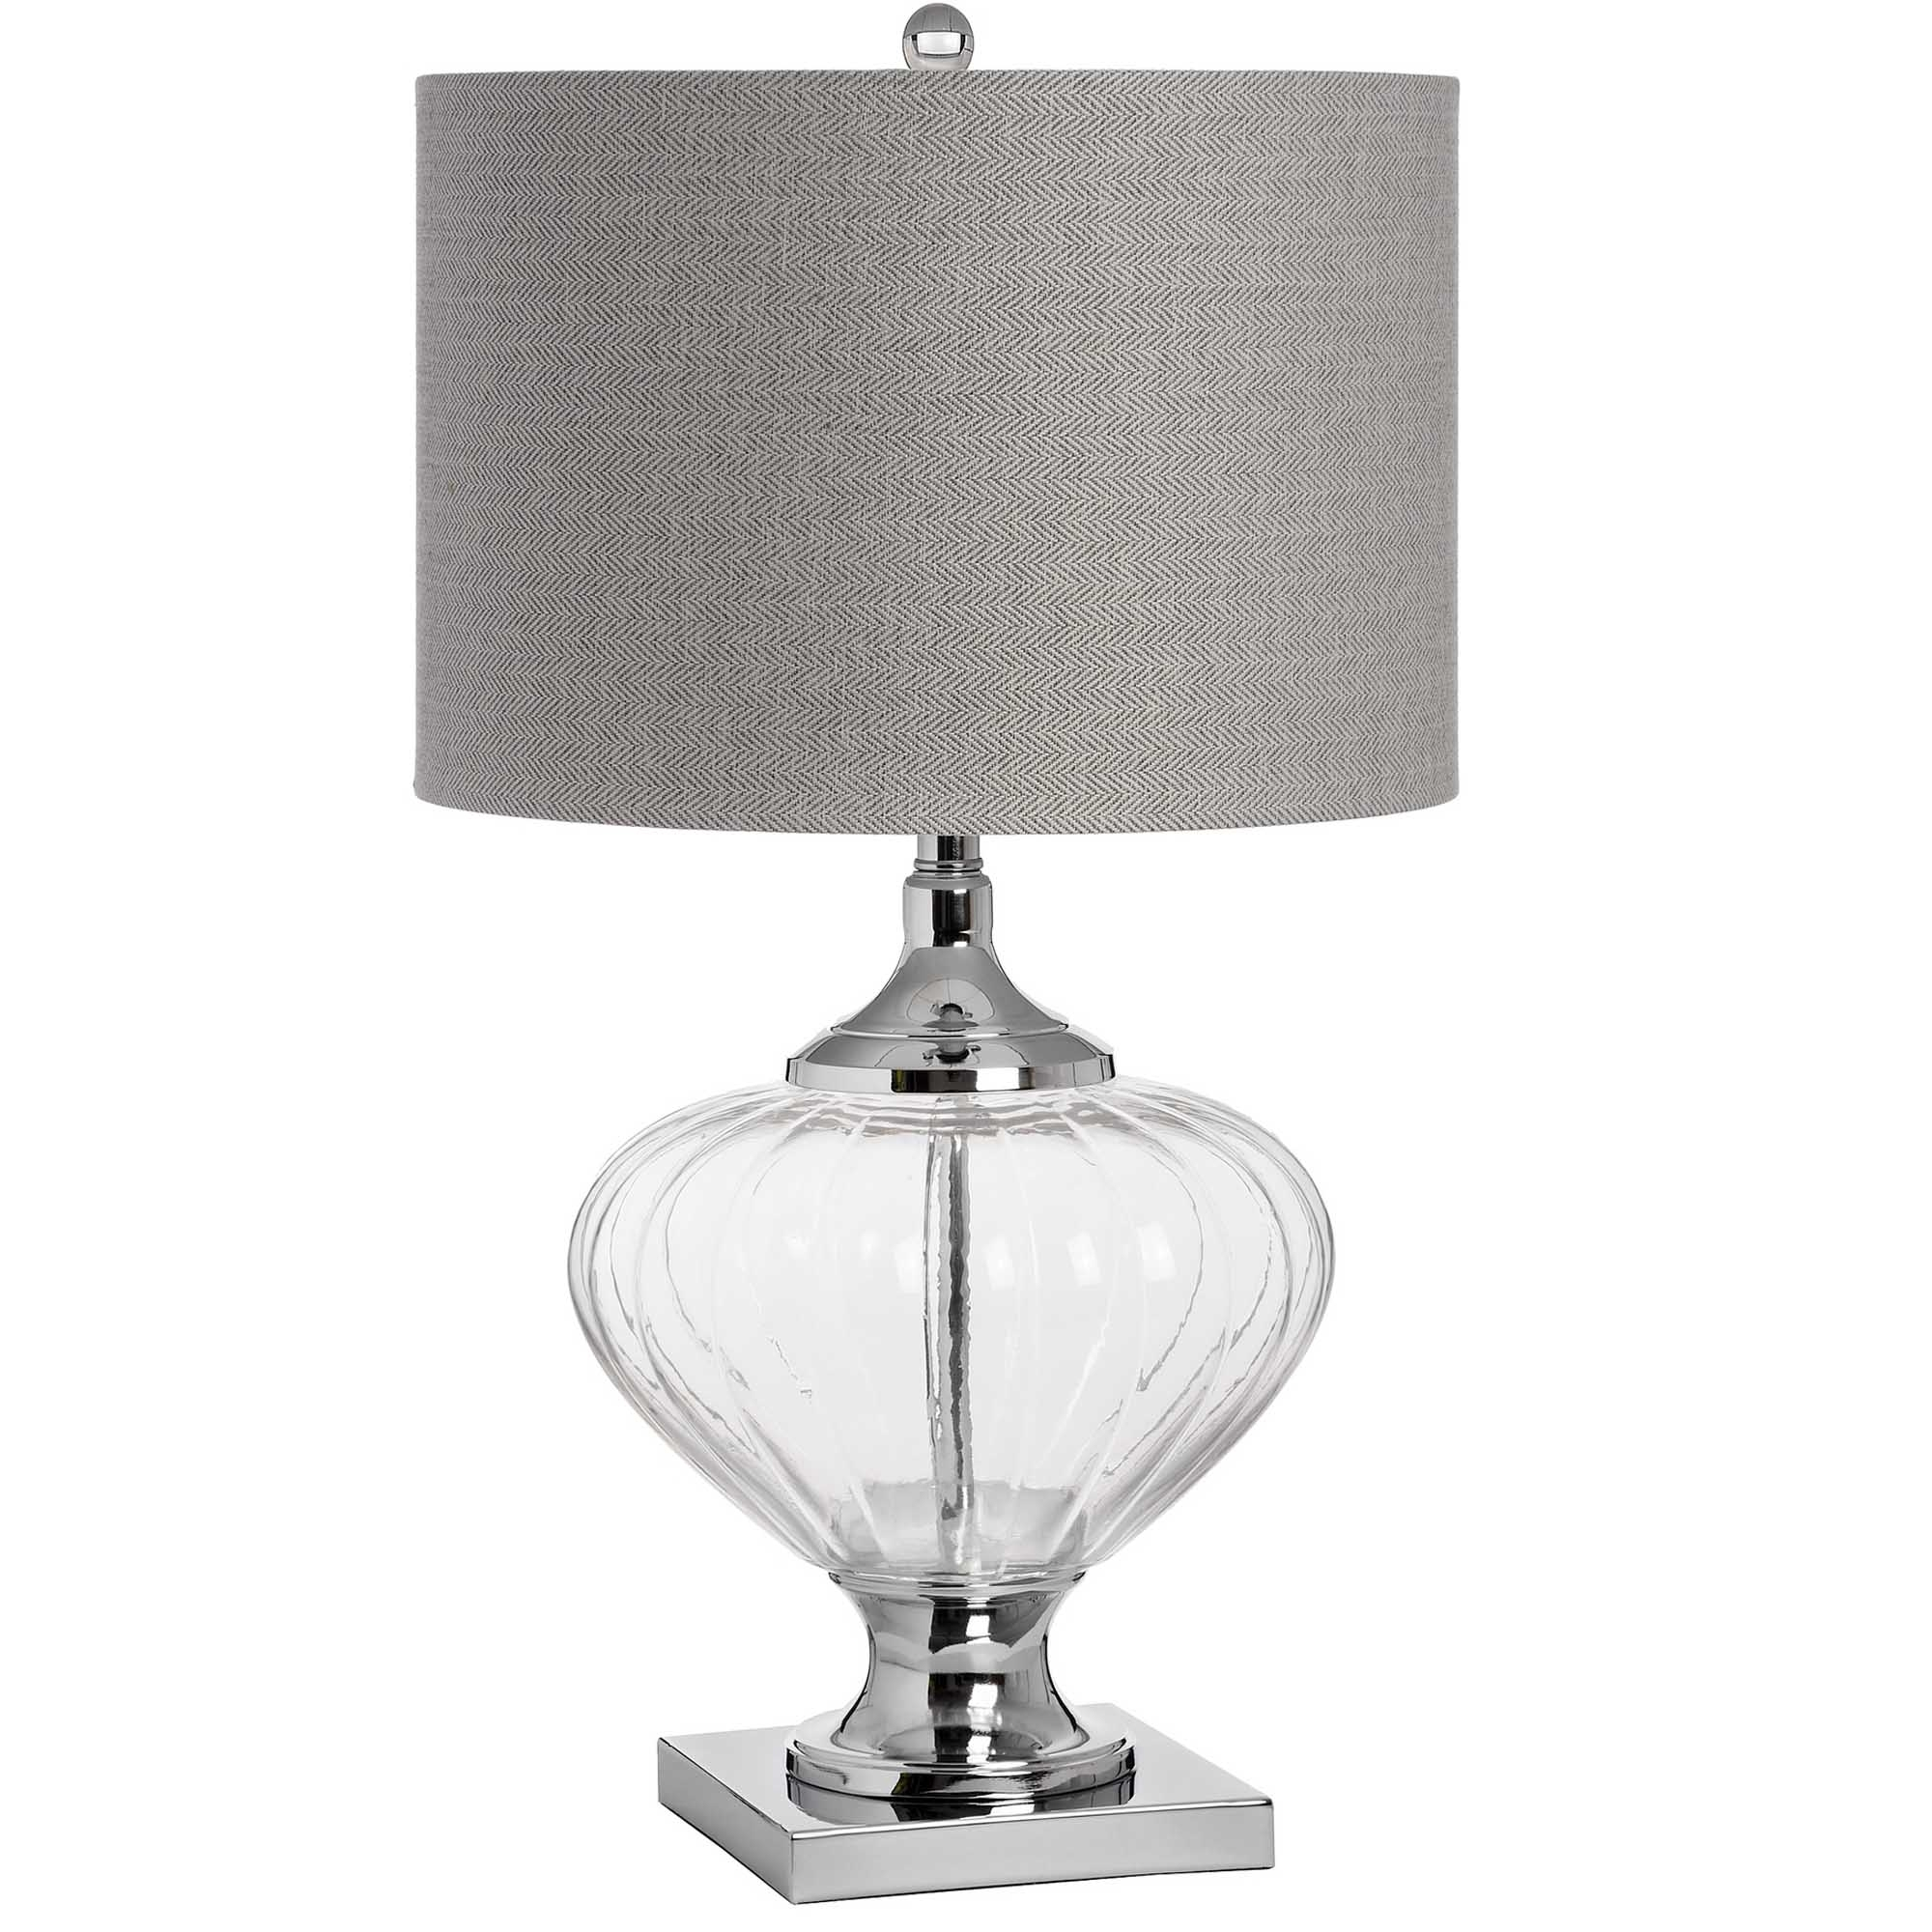 Verona Glass Table Lamp Table Lamp Homesdirect365